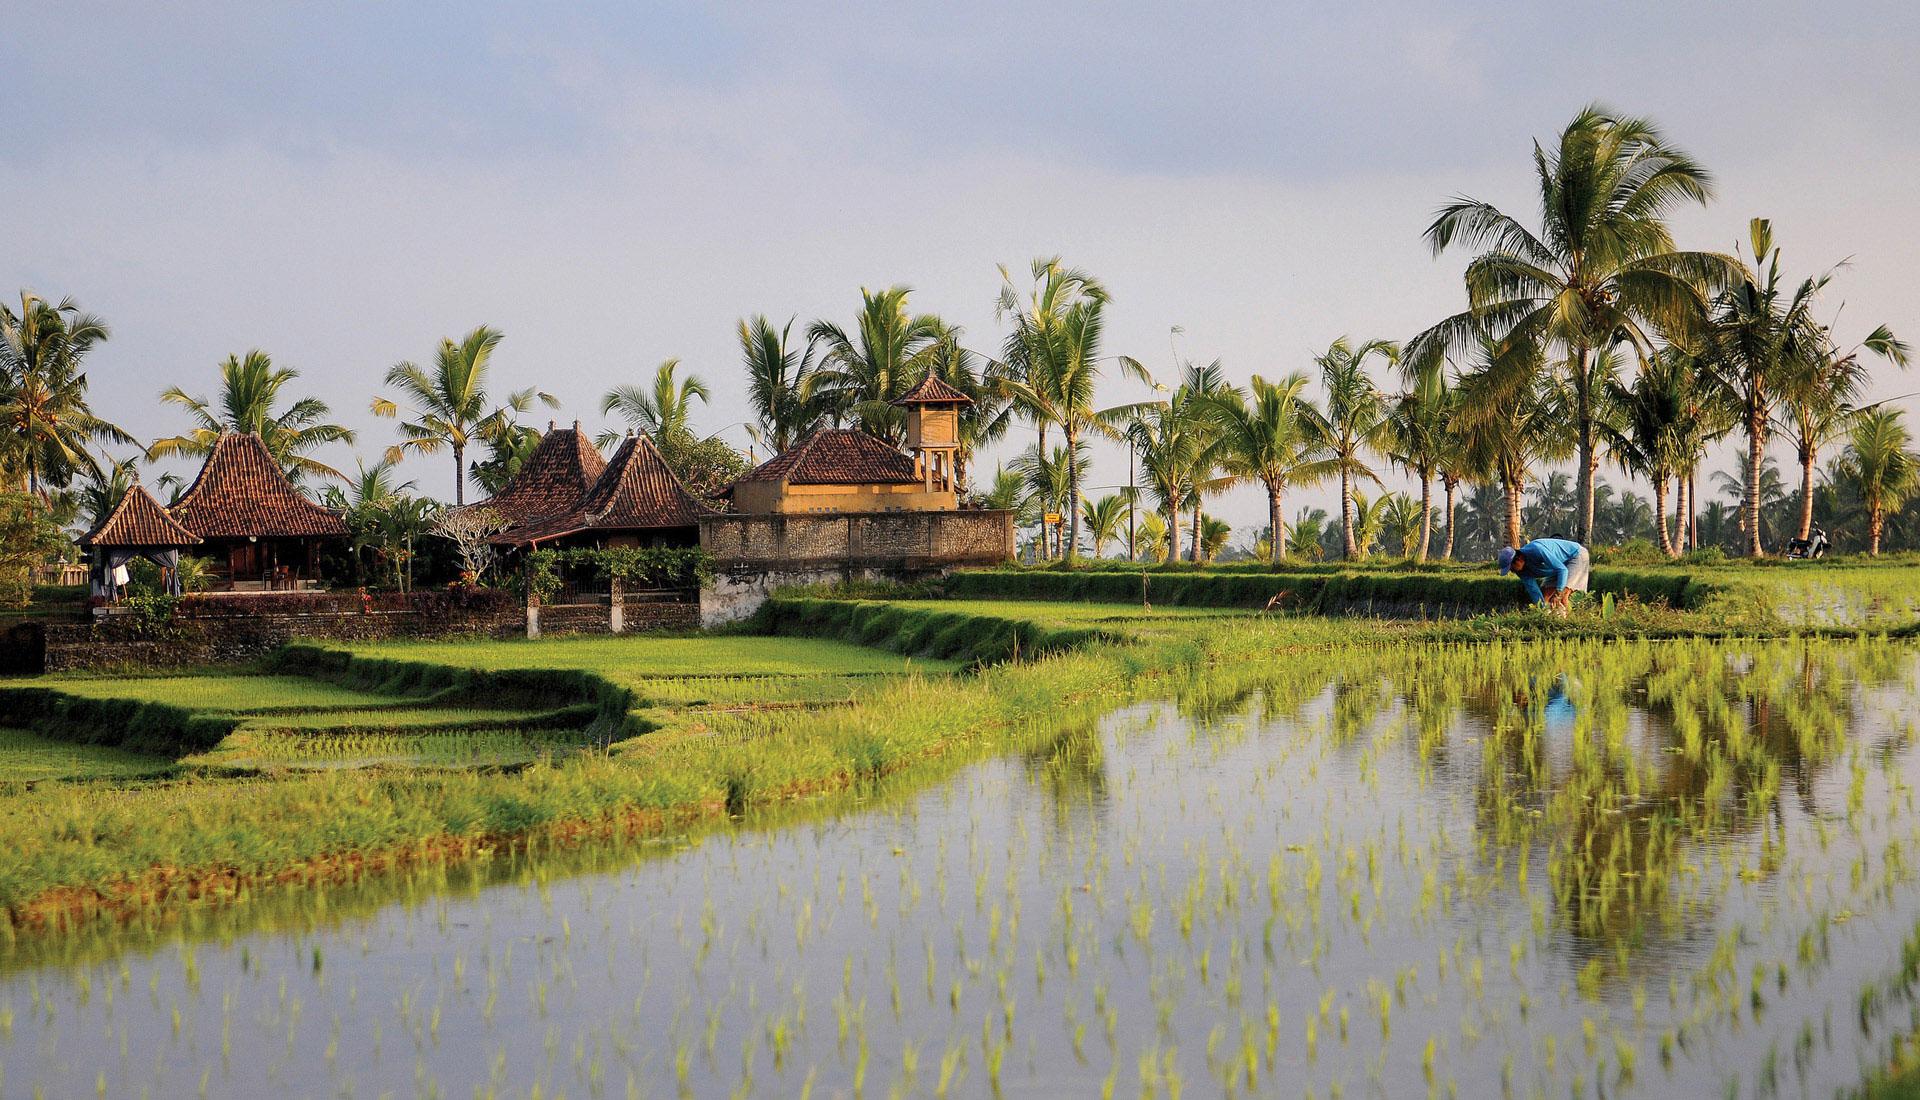 Indonésie - Bali et Pays Toraja